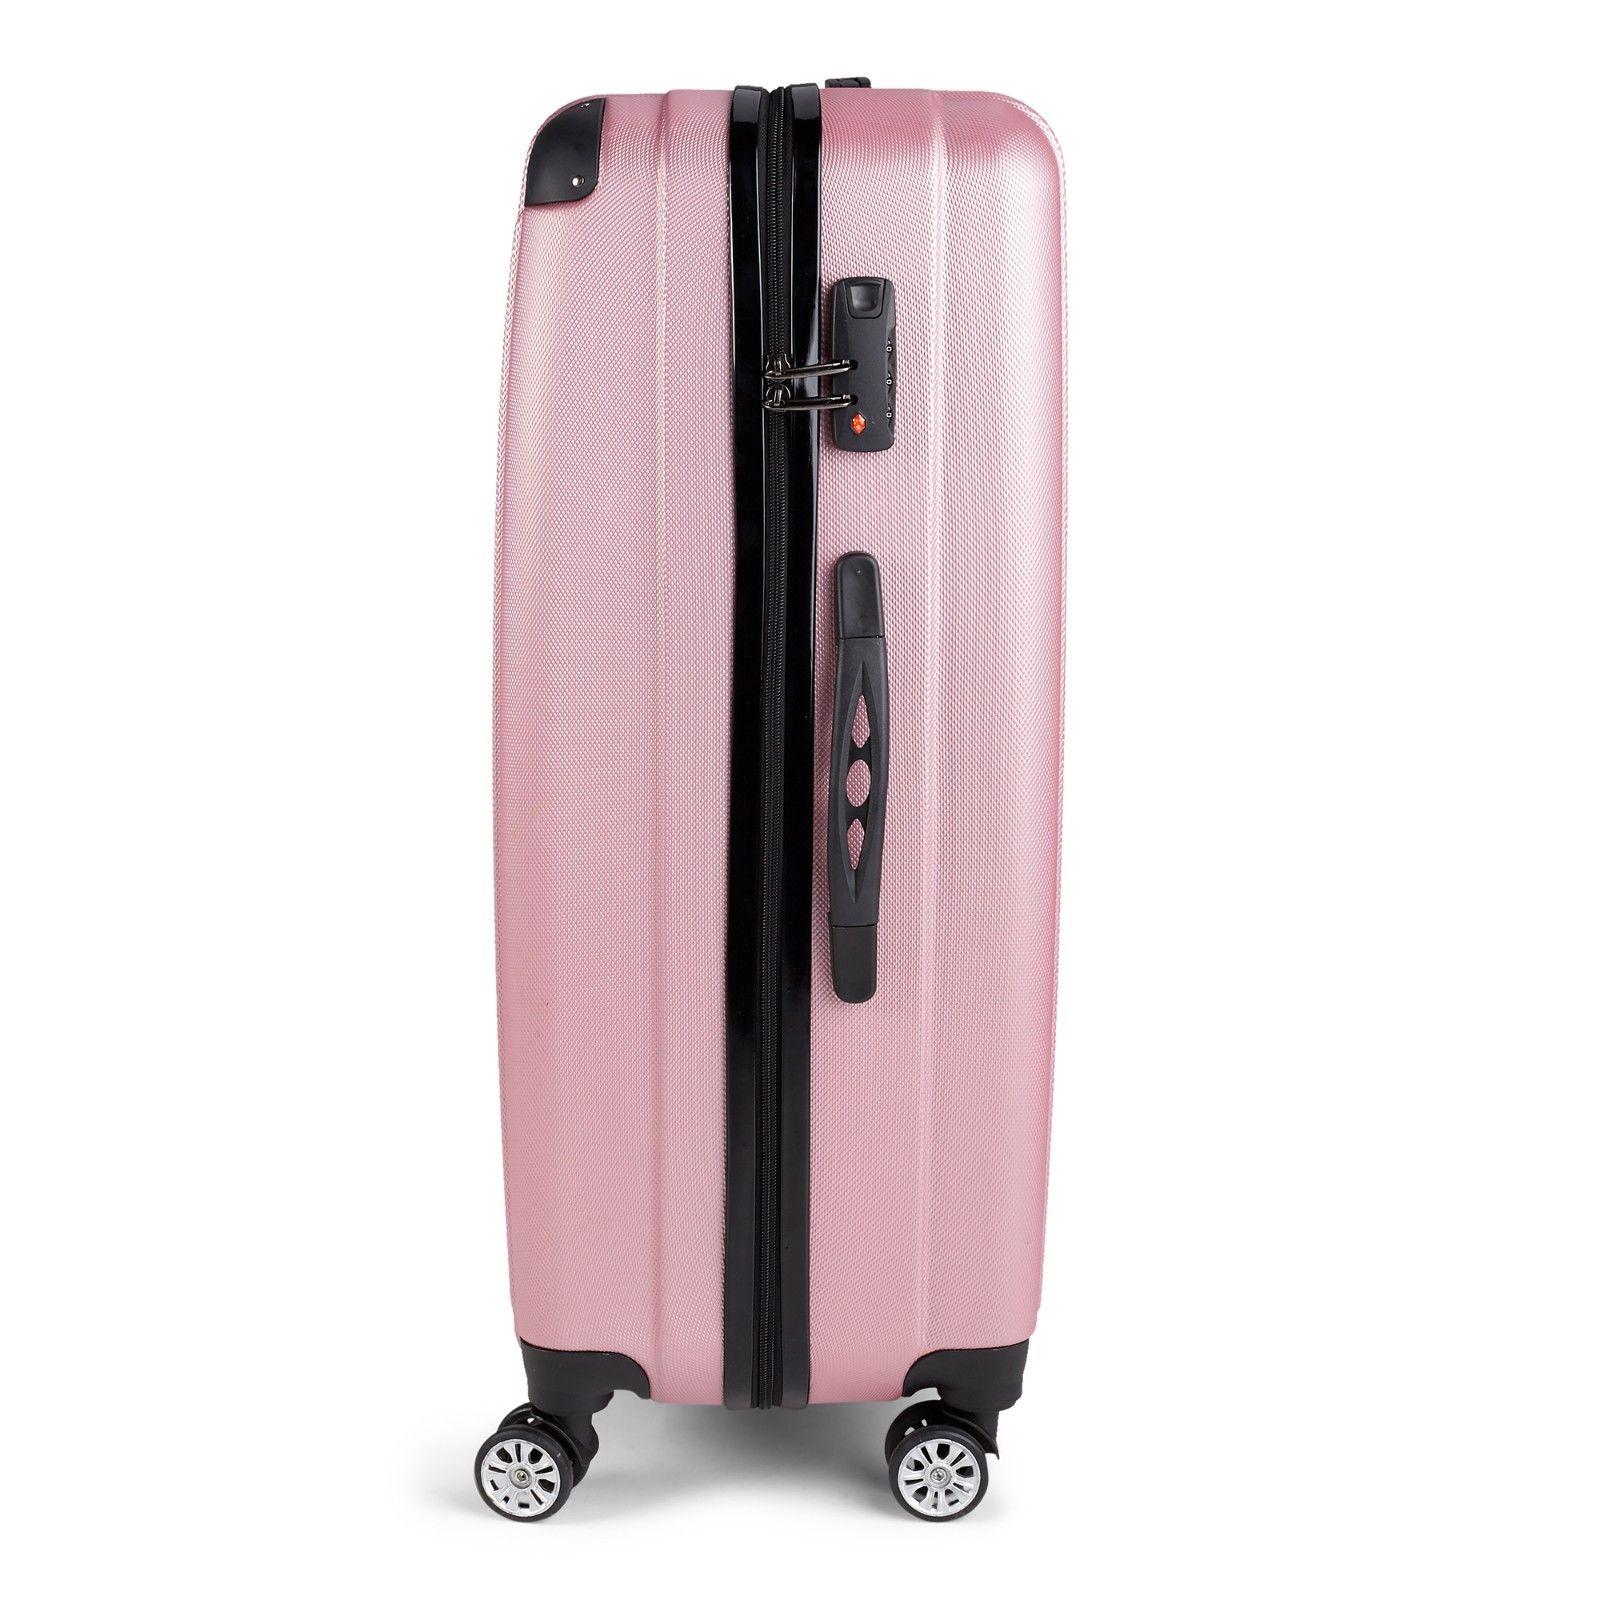 Milano-Premium-3pc-ABS-Luggage-Suitcase-Luxury-Hard-Case-Shockproof-Travel-Set thumbnail 22